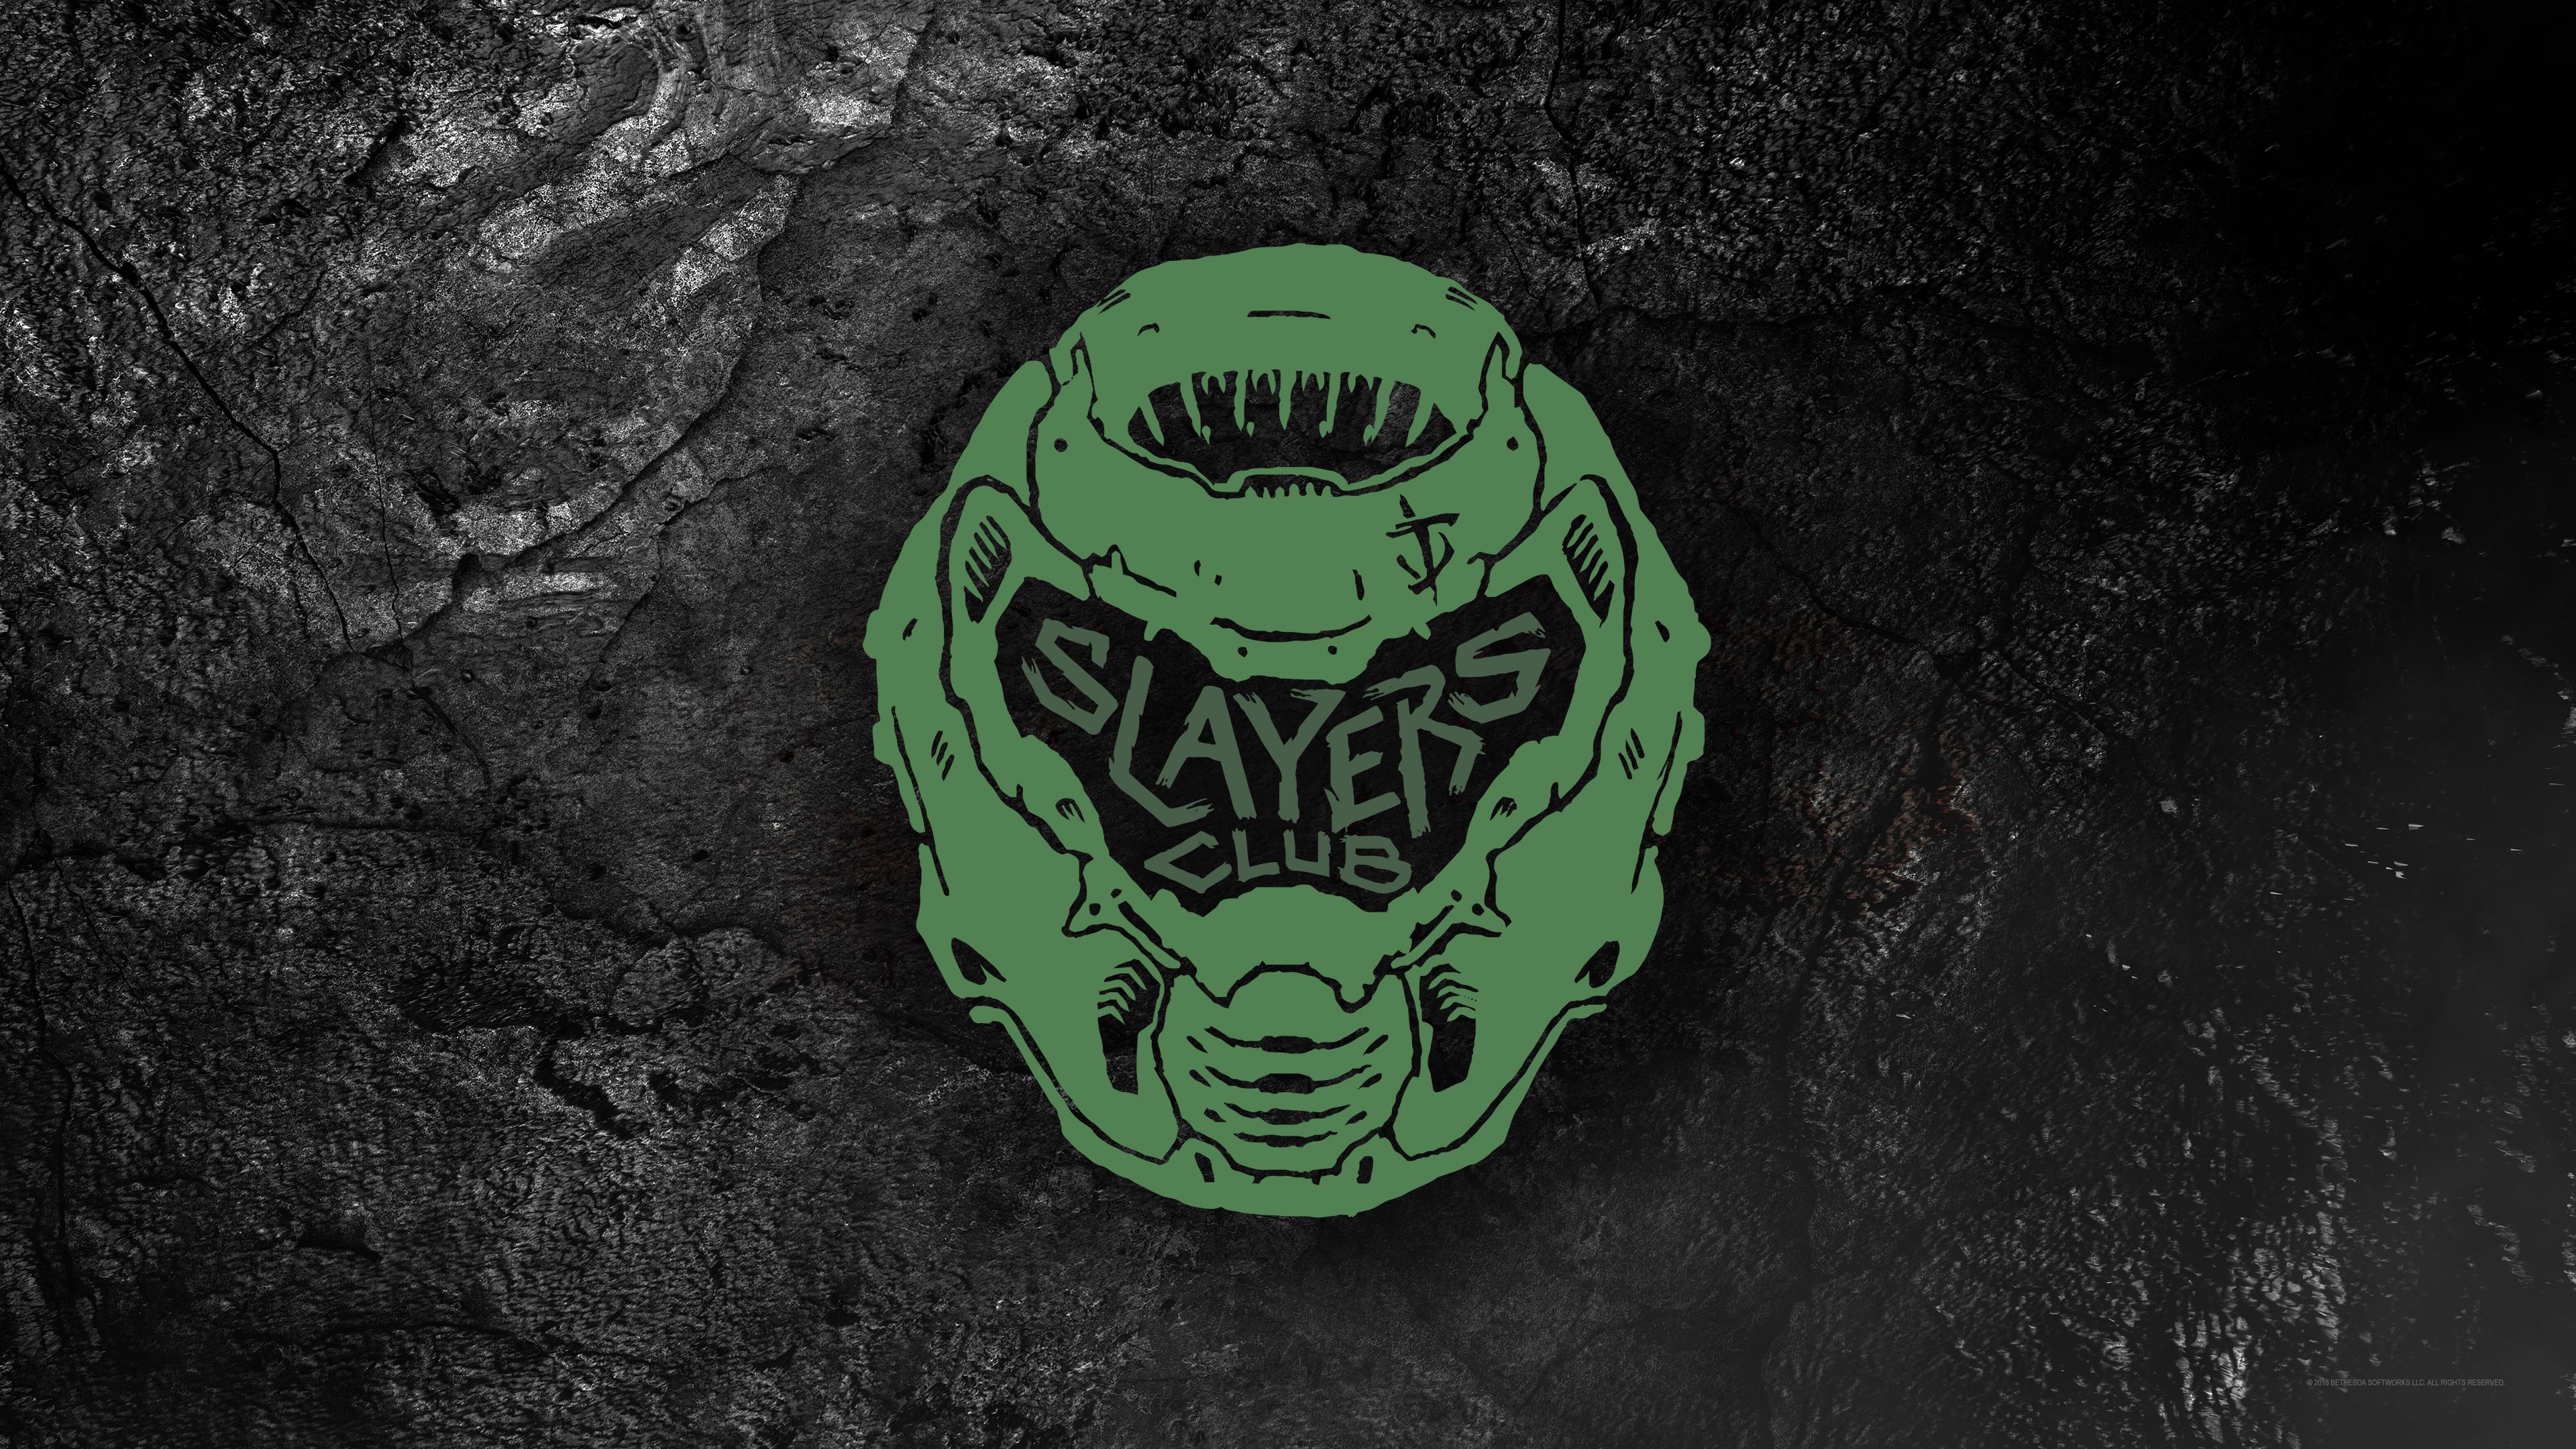 Doom Slayers Club 4k Ultra Hd Wallpaper Background Image